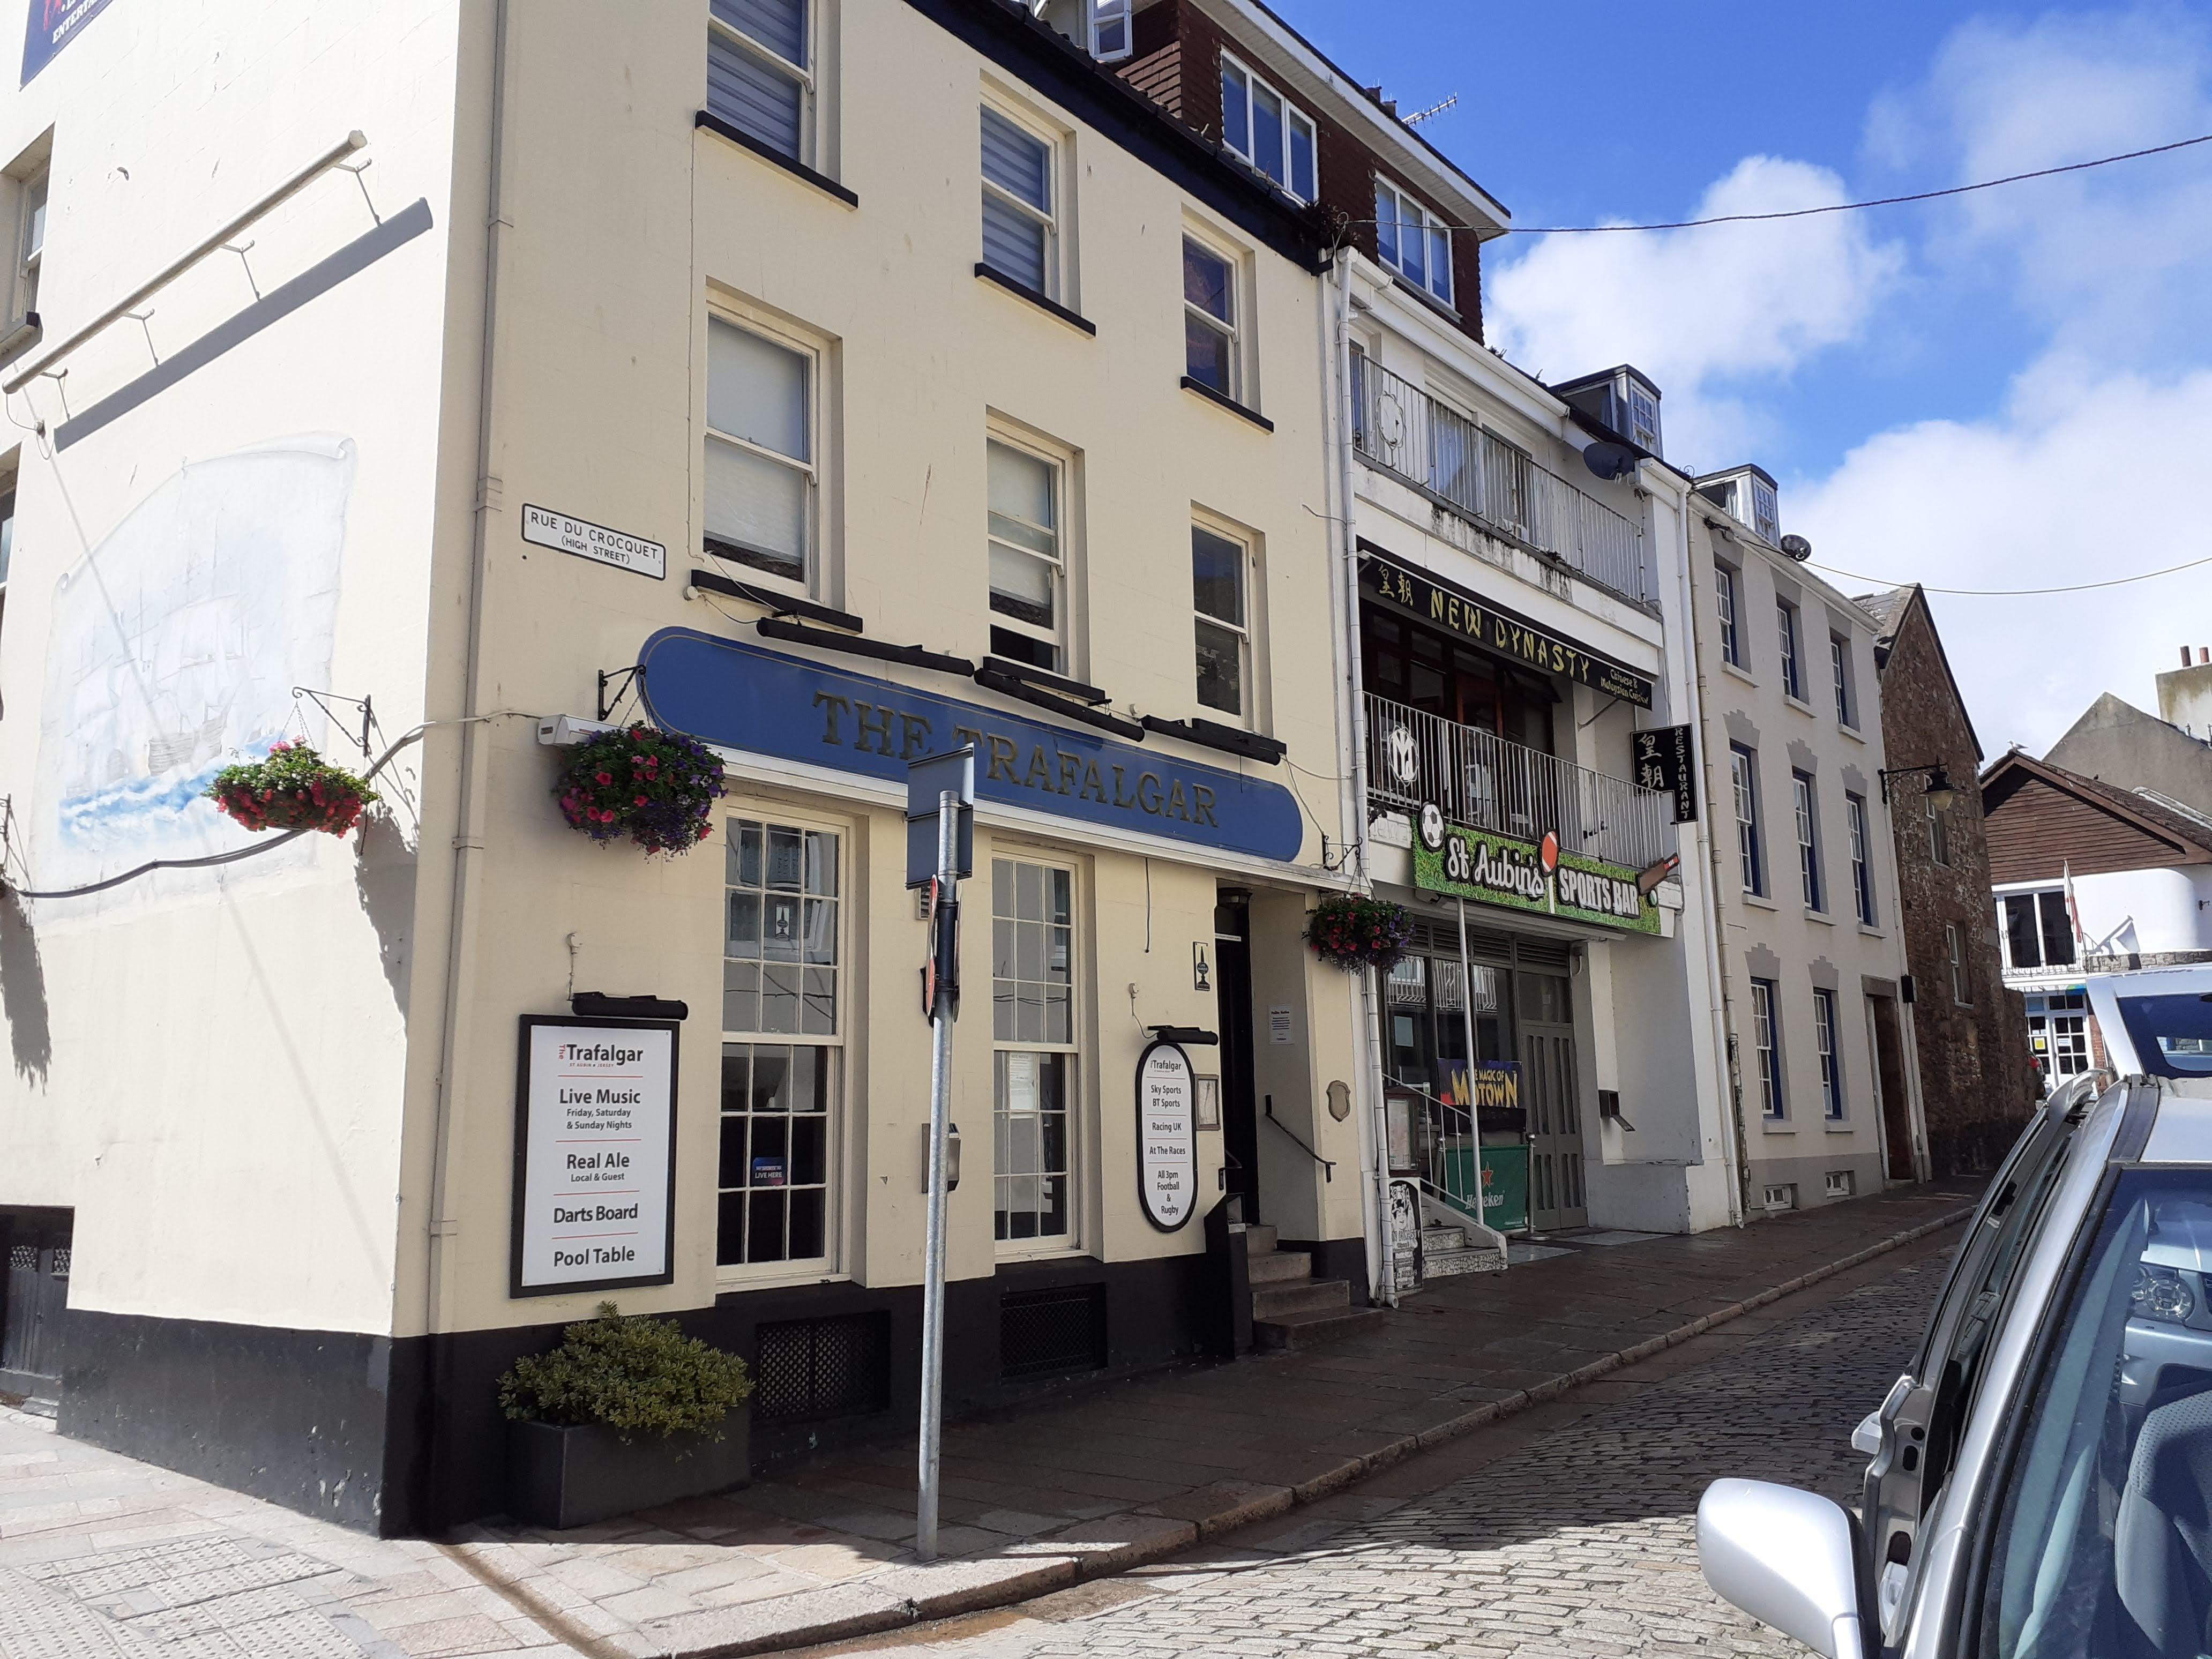 The Trafalgar Inn